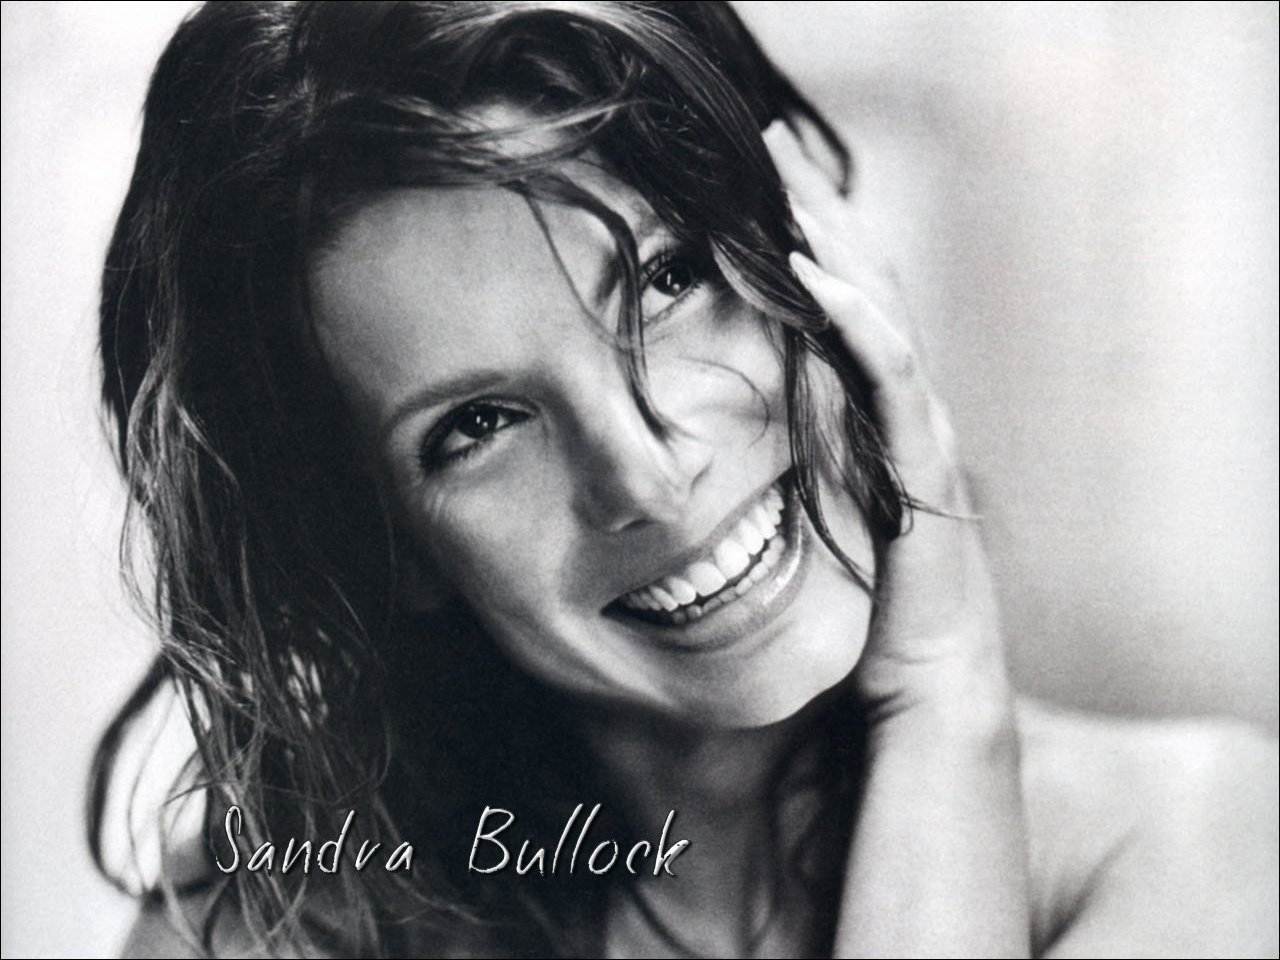 http://3.bp.blogspot.com/_SL8tGXFmKPE/TOS8q3hdBlI/AAAAAAAAAKw/YdfM75QKb98/s1600/Sandra+Bullock.jpg